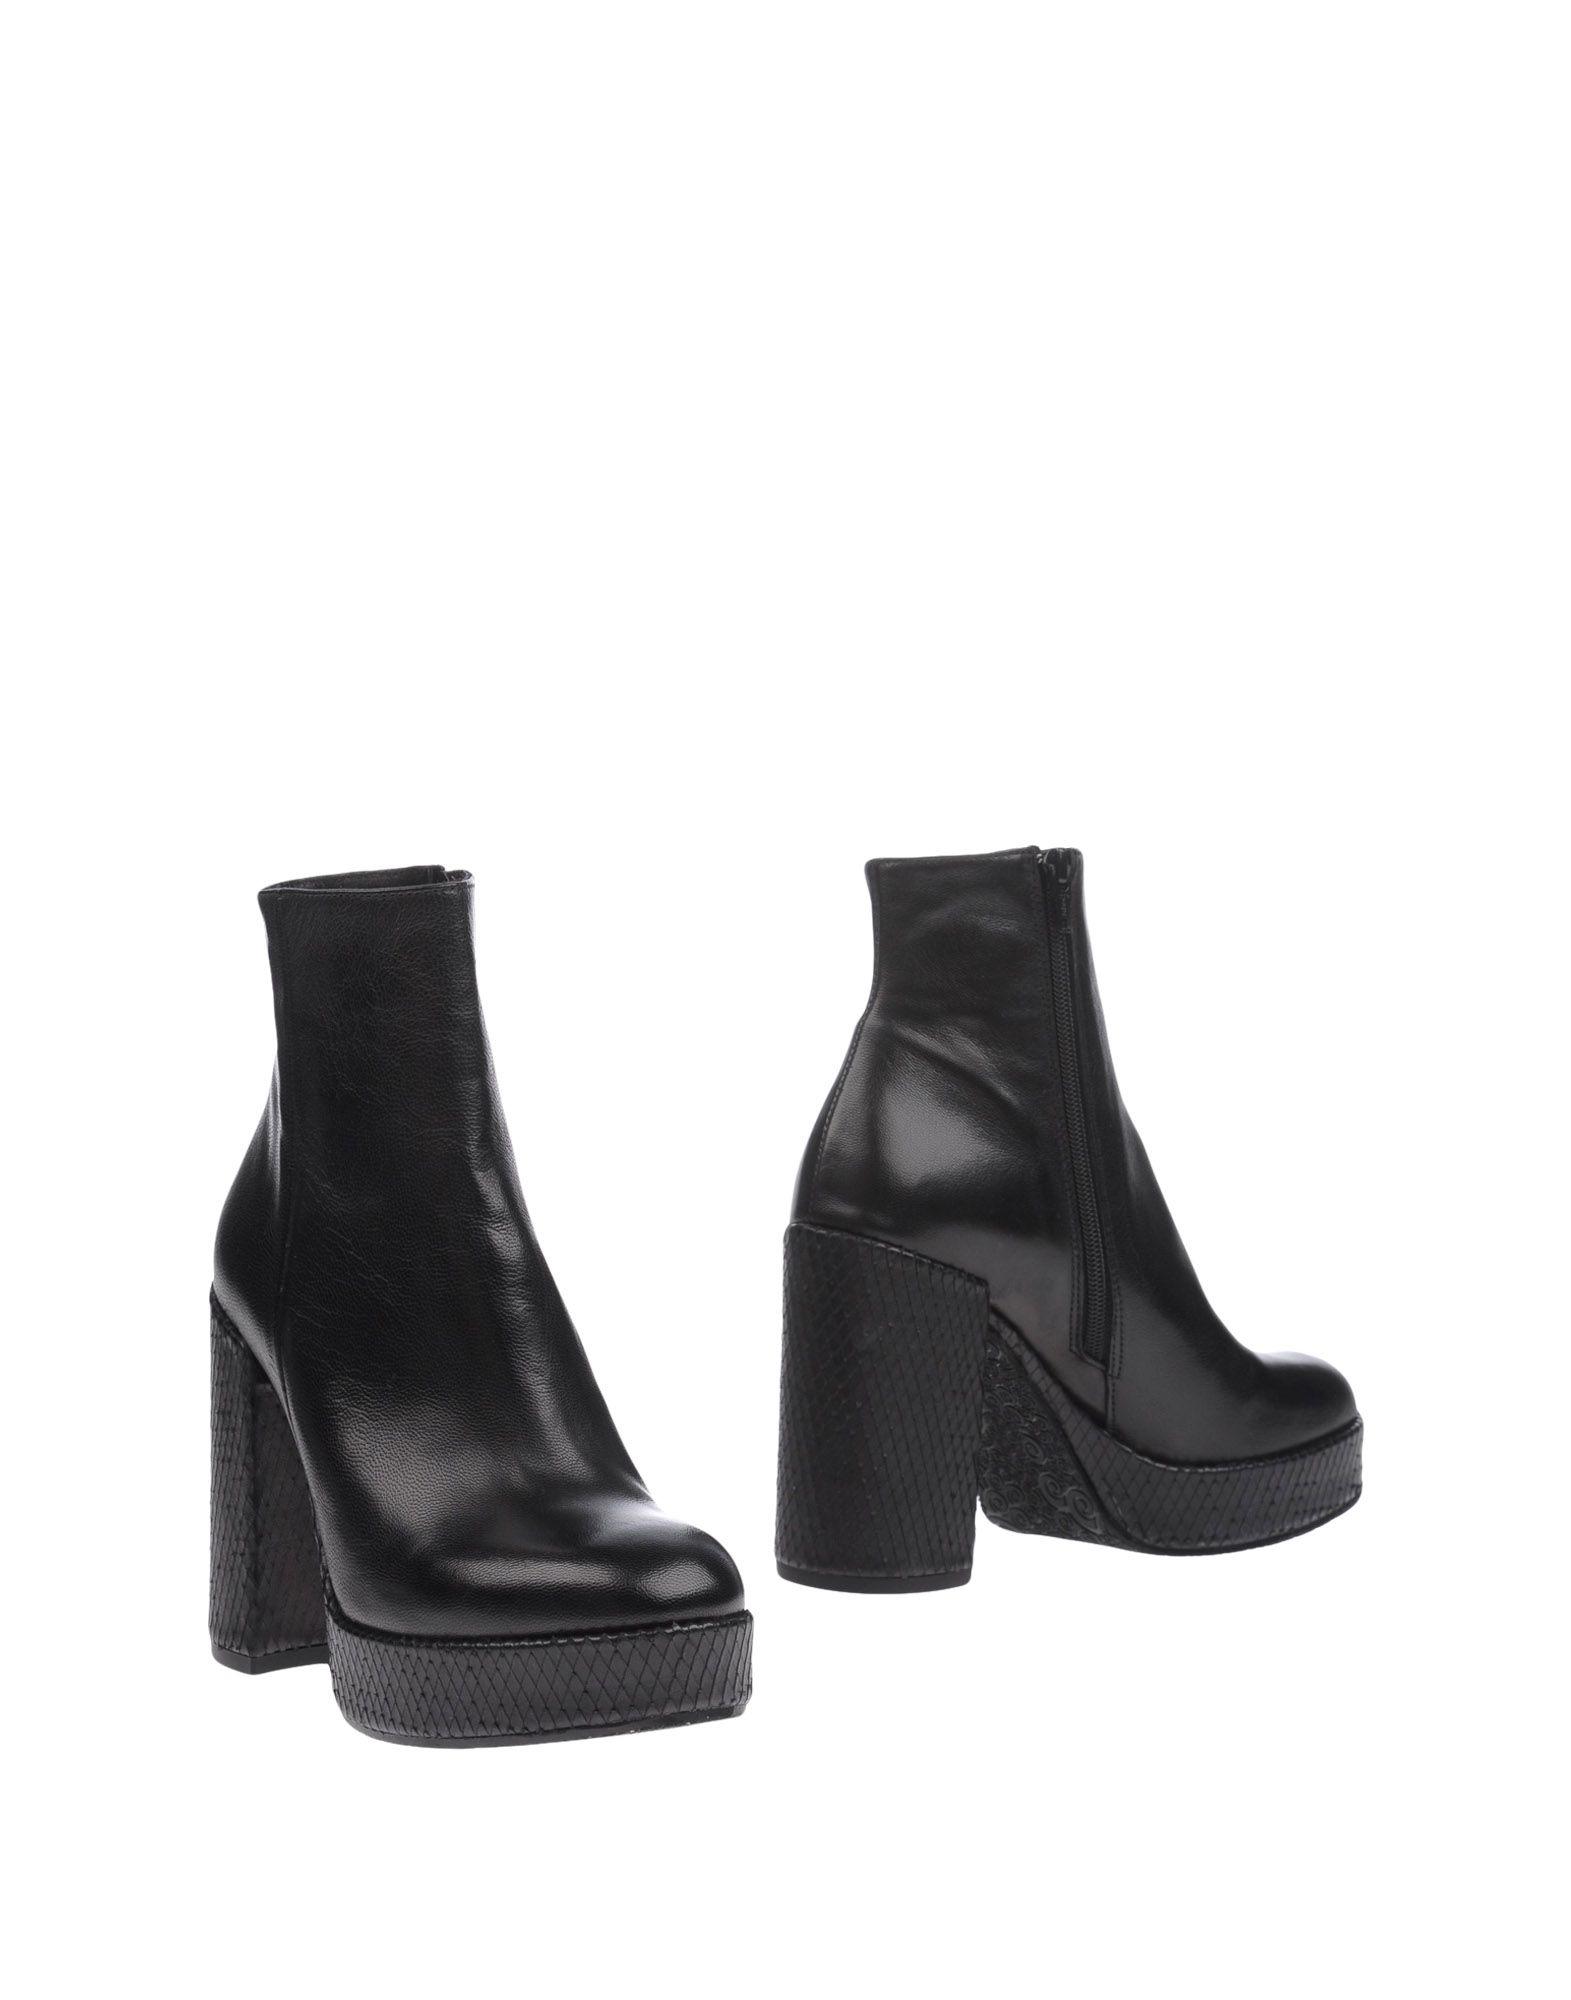 Unlace Stiefelette Damen 11221615OS  11221615OS Damen Gute Qualität beliebte Schuhe eb203e